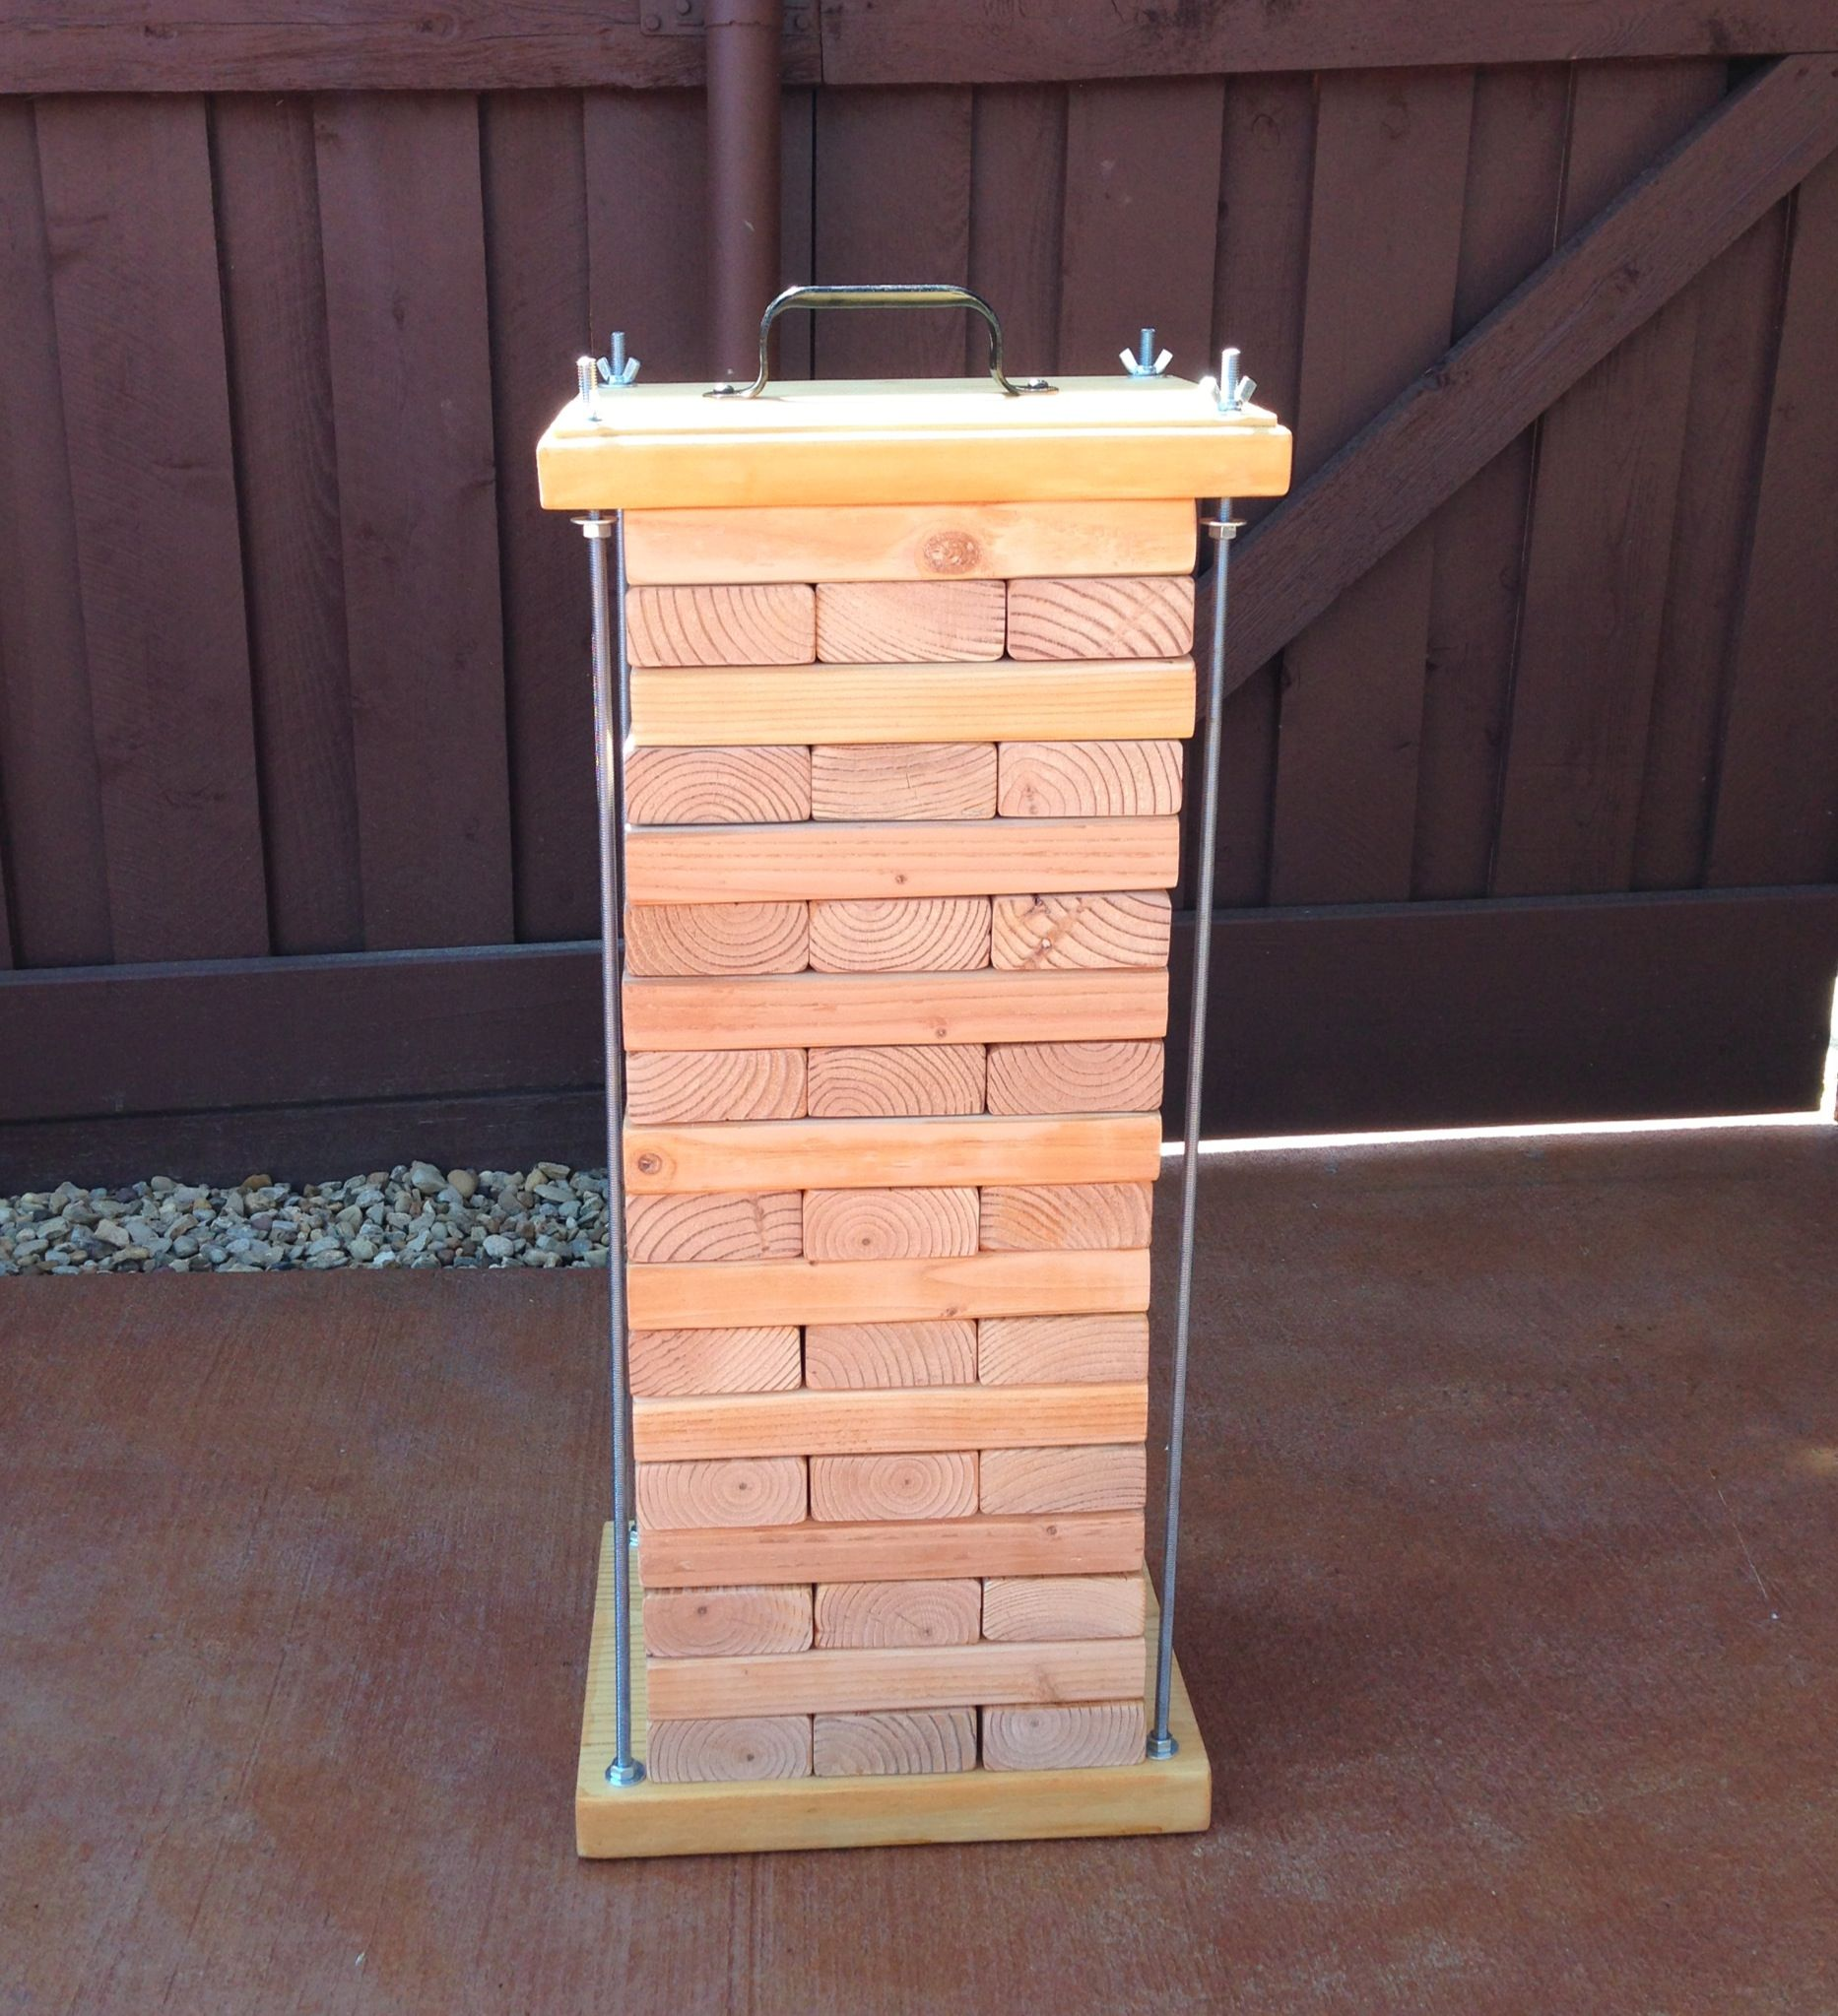 homemade life sized jenga set 2x4 boards cut into 10 5